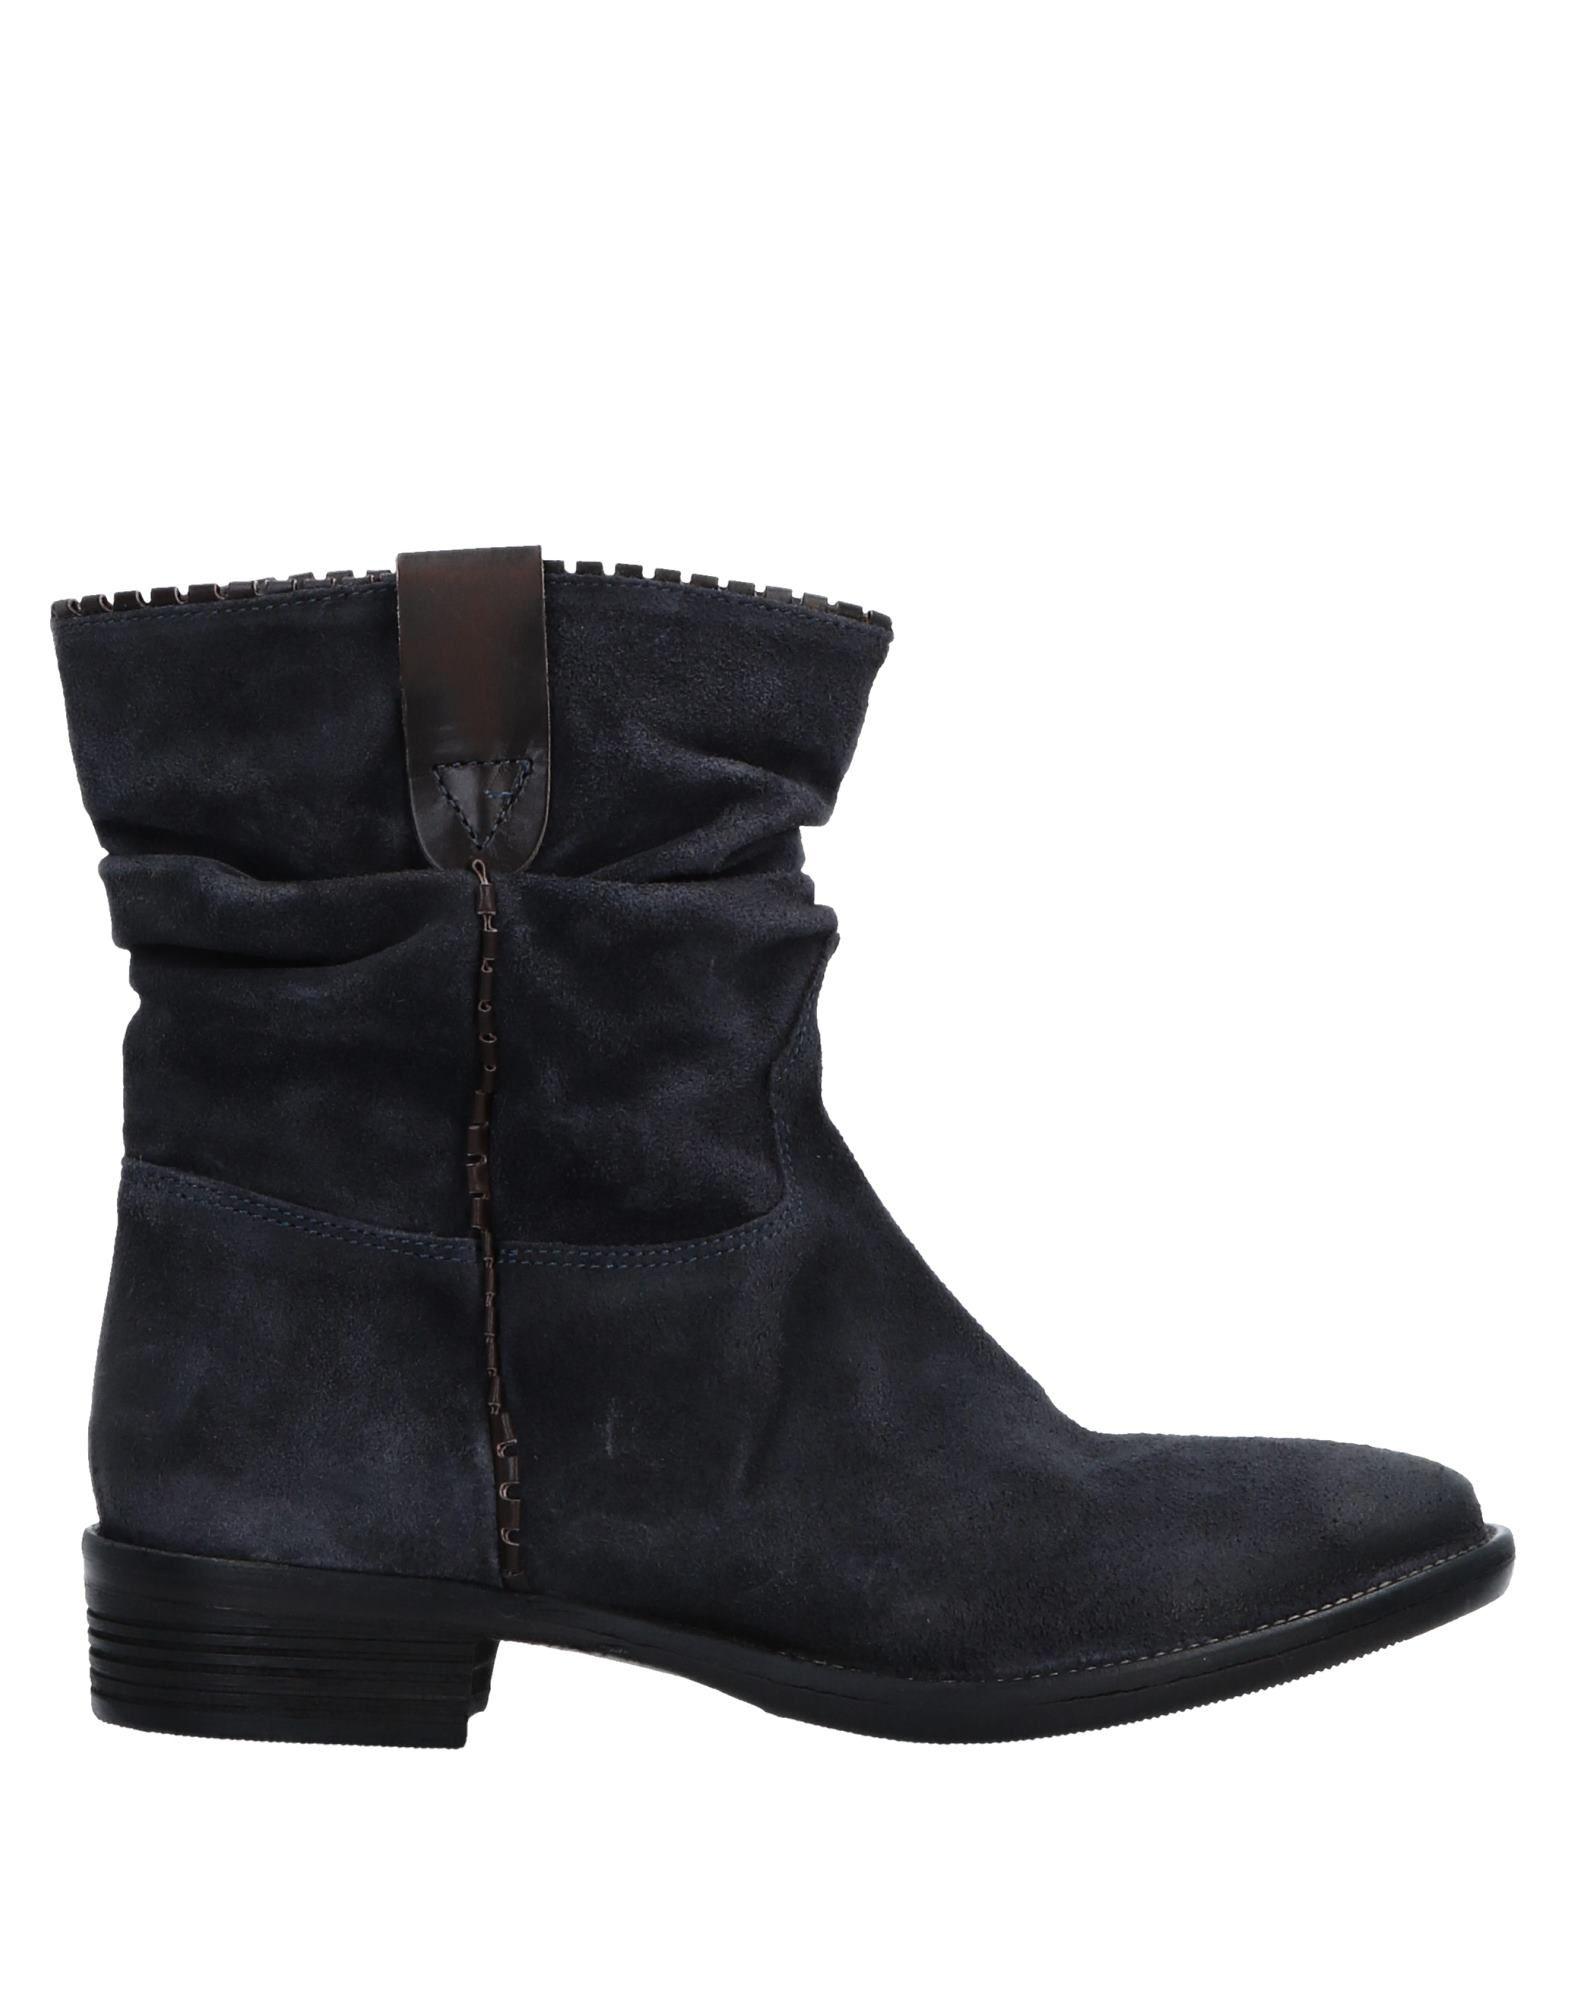 HUNDRED 100 Ankle Boot in Slate Blue